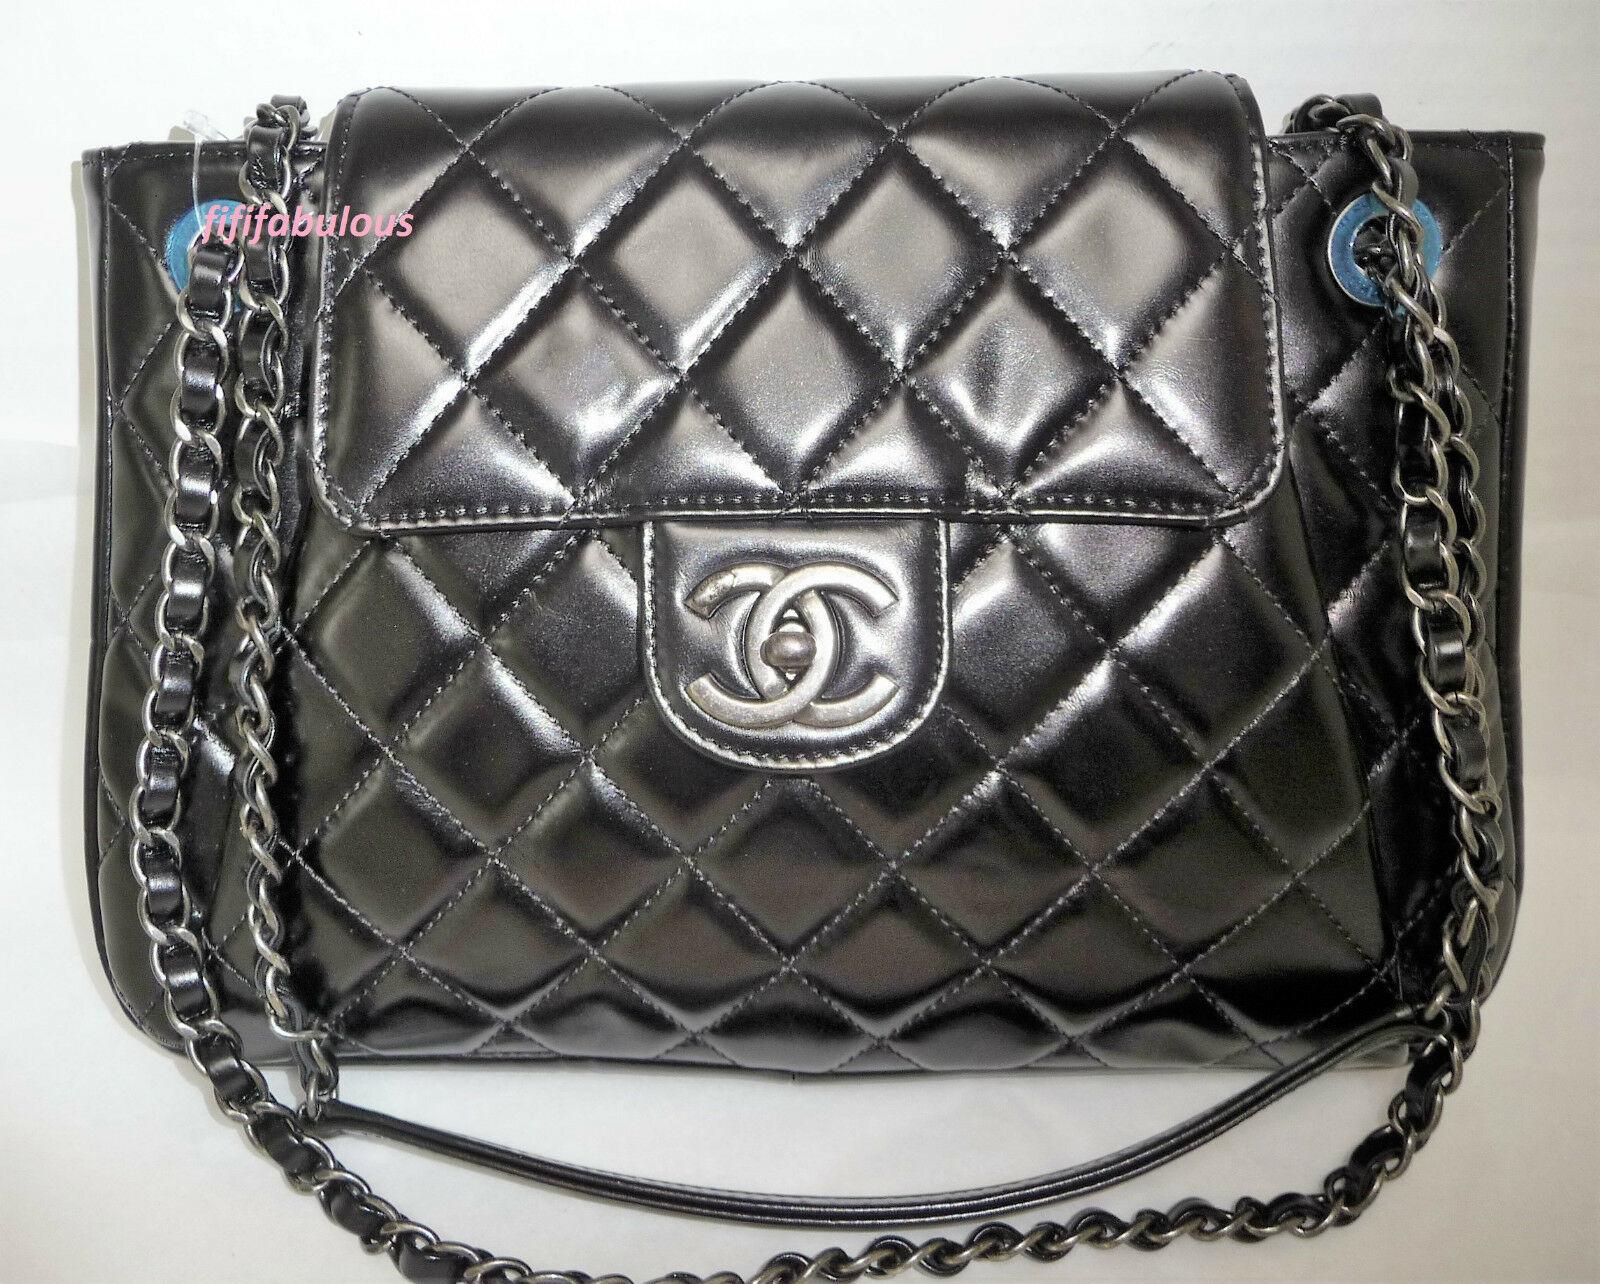 Chanel Jumbo Black Calfskin Accordion Classic Flap Bag New